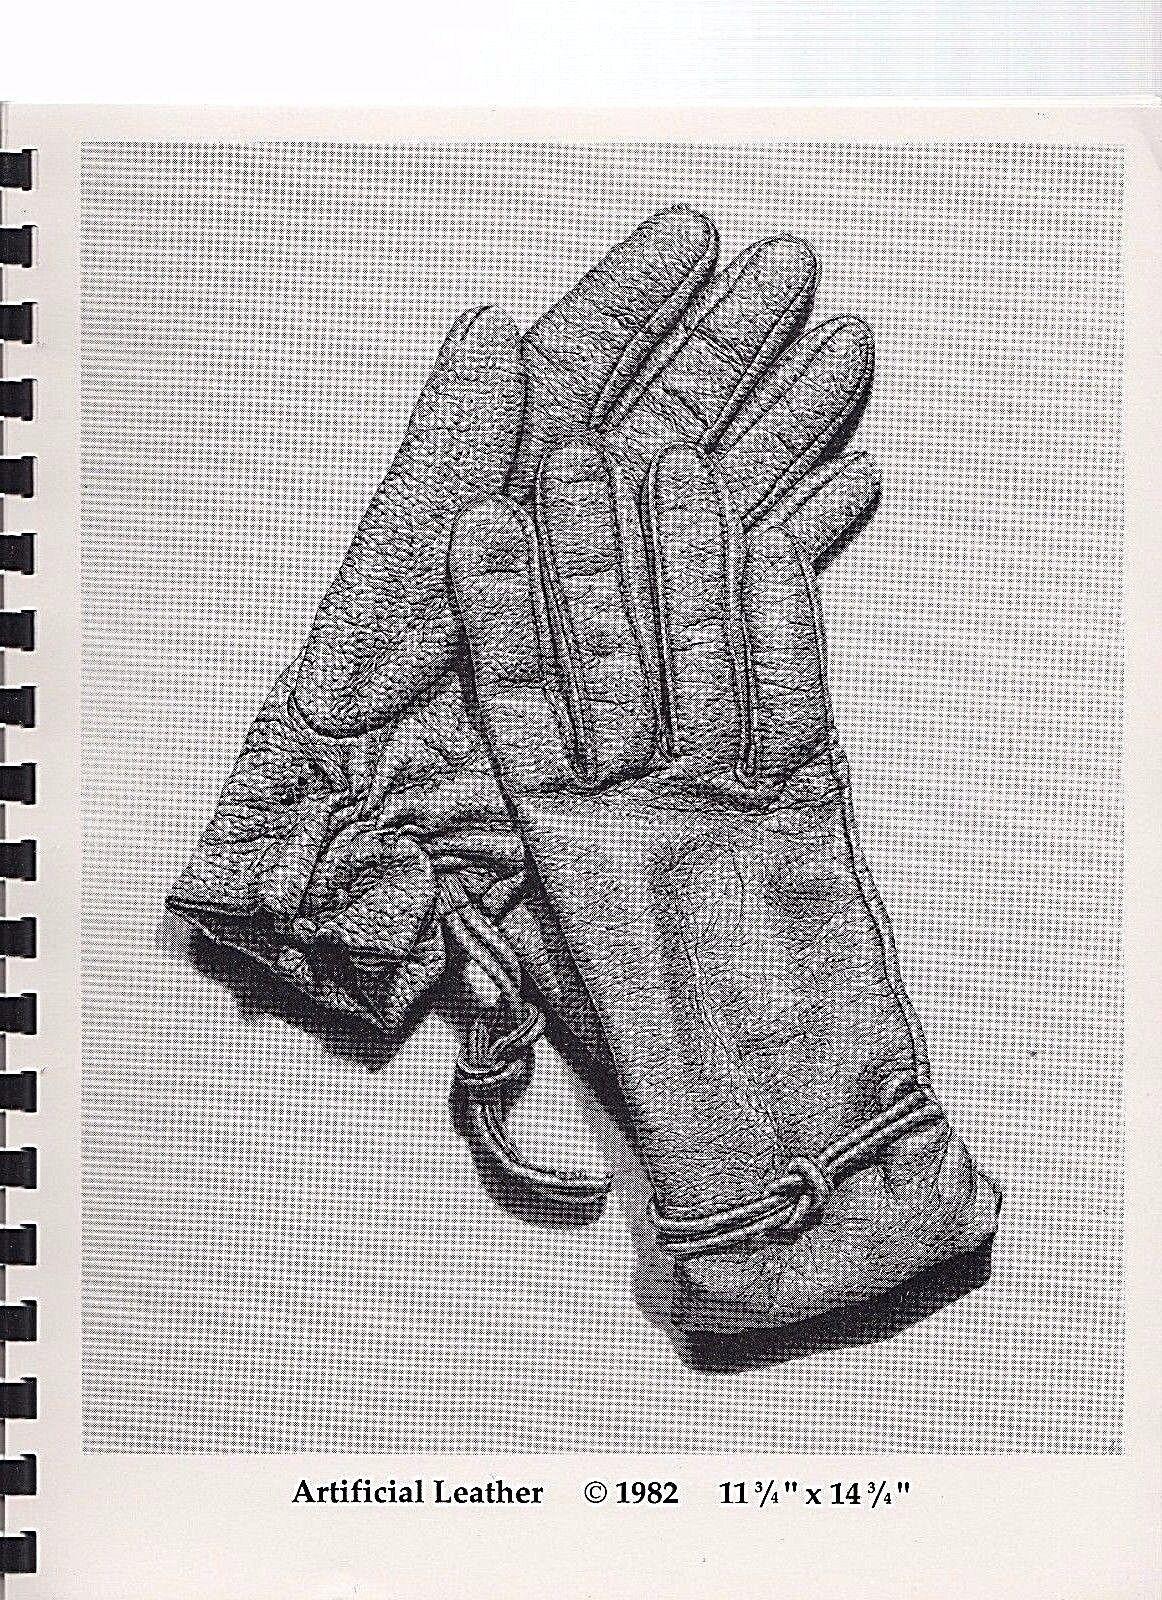 Portfolio David T Hubbard-Collection Of 12 Pencil Drawings-1990-Art-Artists - $24.95